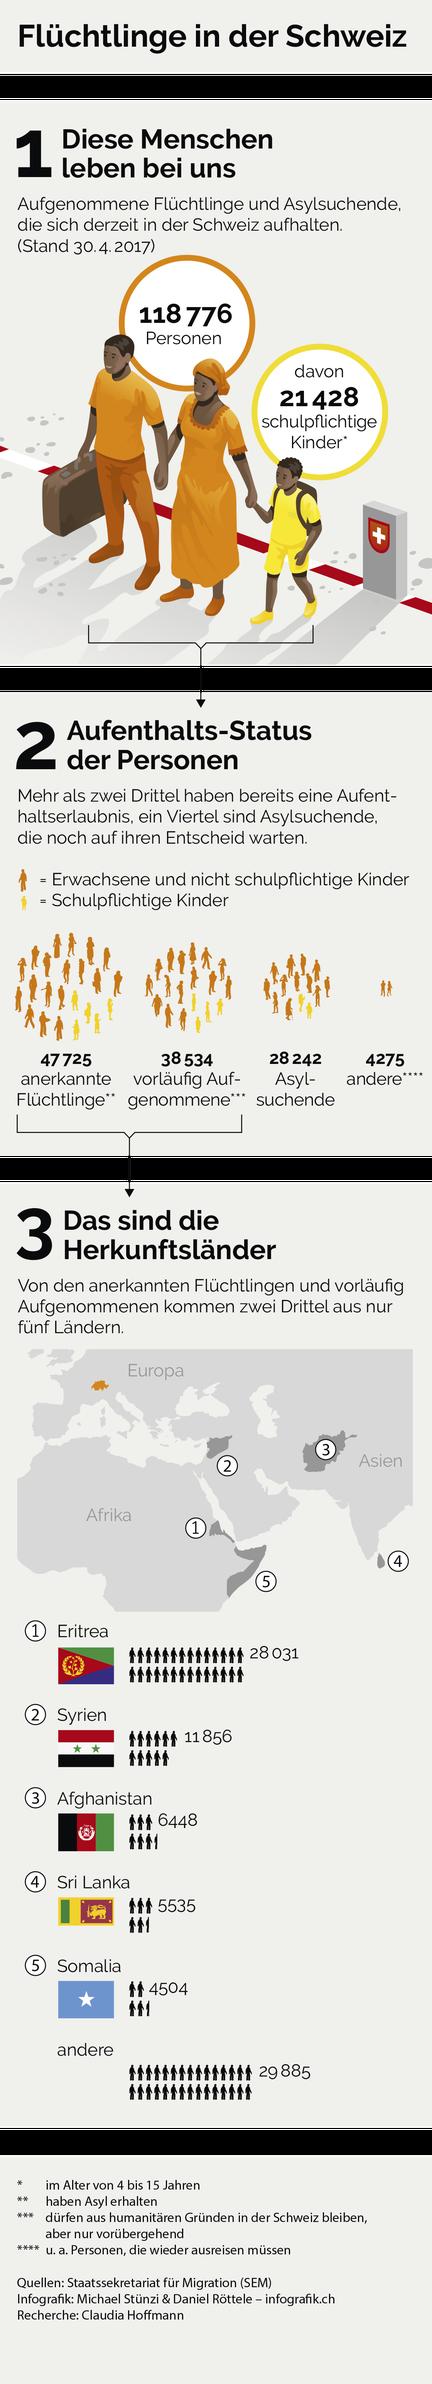 Infografik Flüchtlinge in der Schweiz © Michael Stünzi